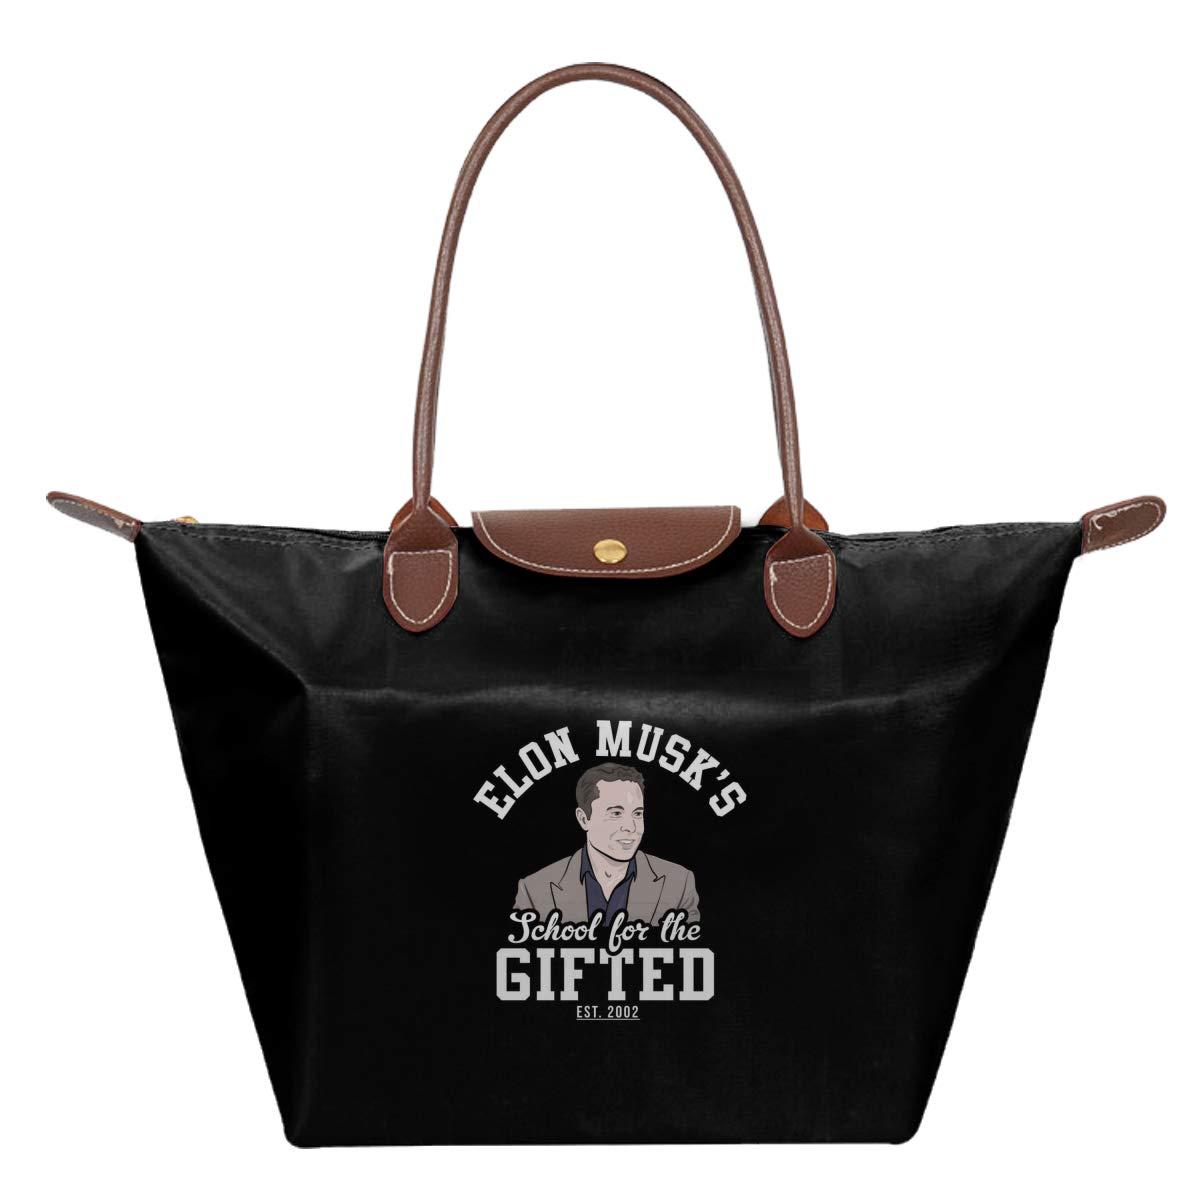 Academies Elon Musks School For The Gifted Waterproof Leather Folded Messenger Nylon Bag Travel Tote Hopping Folding School Handbags